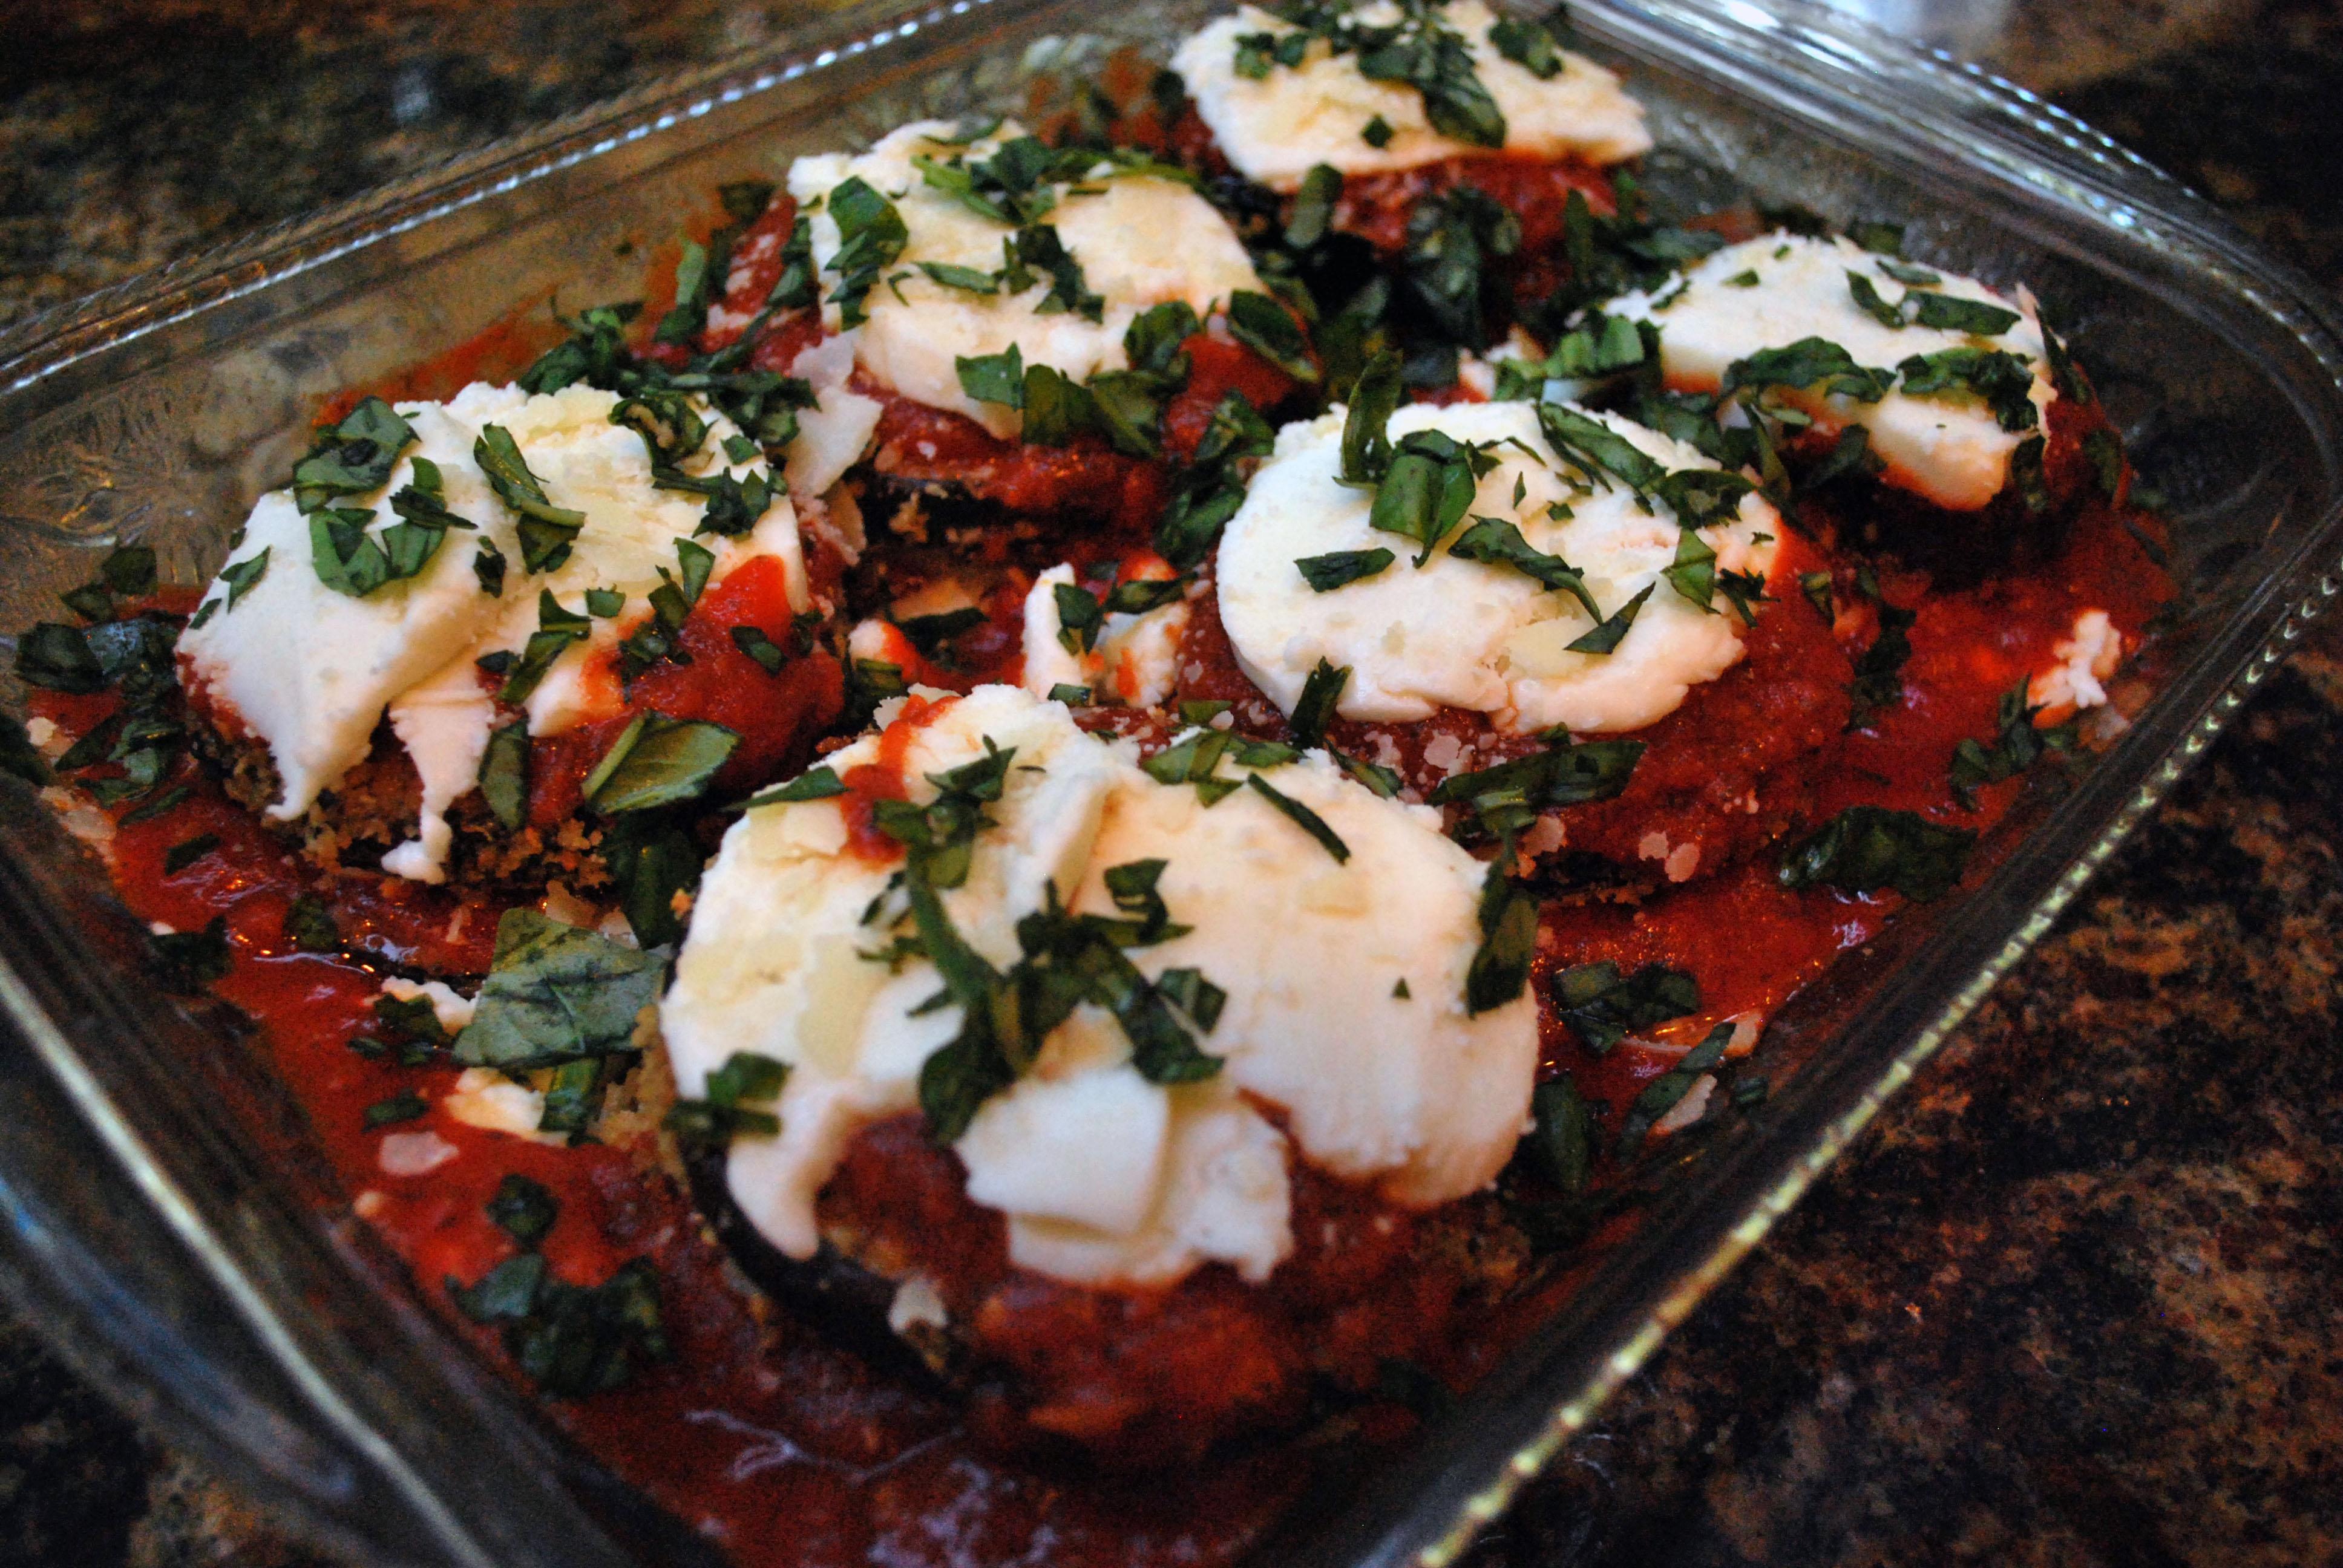 Baked Eggplant Parmesan - Valerie's Kitchen